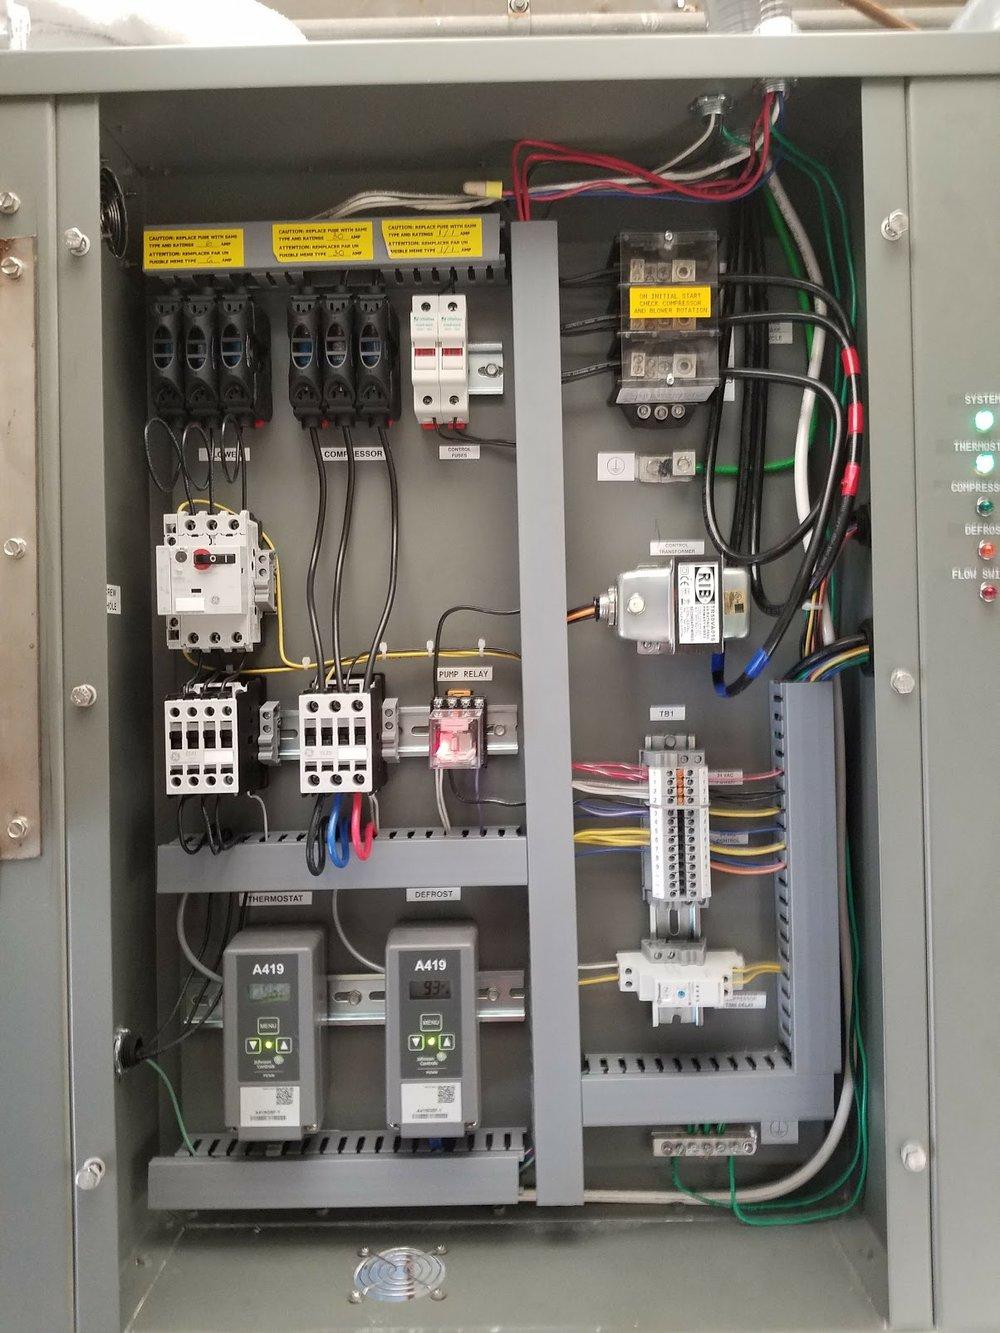 20161028_170852_001 - Heat Pump Internal Wiring.jpg